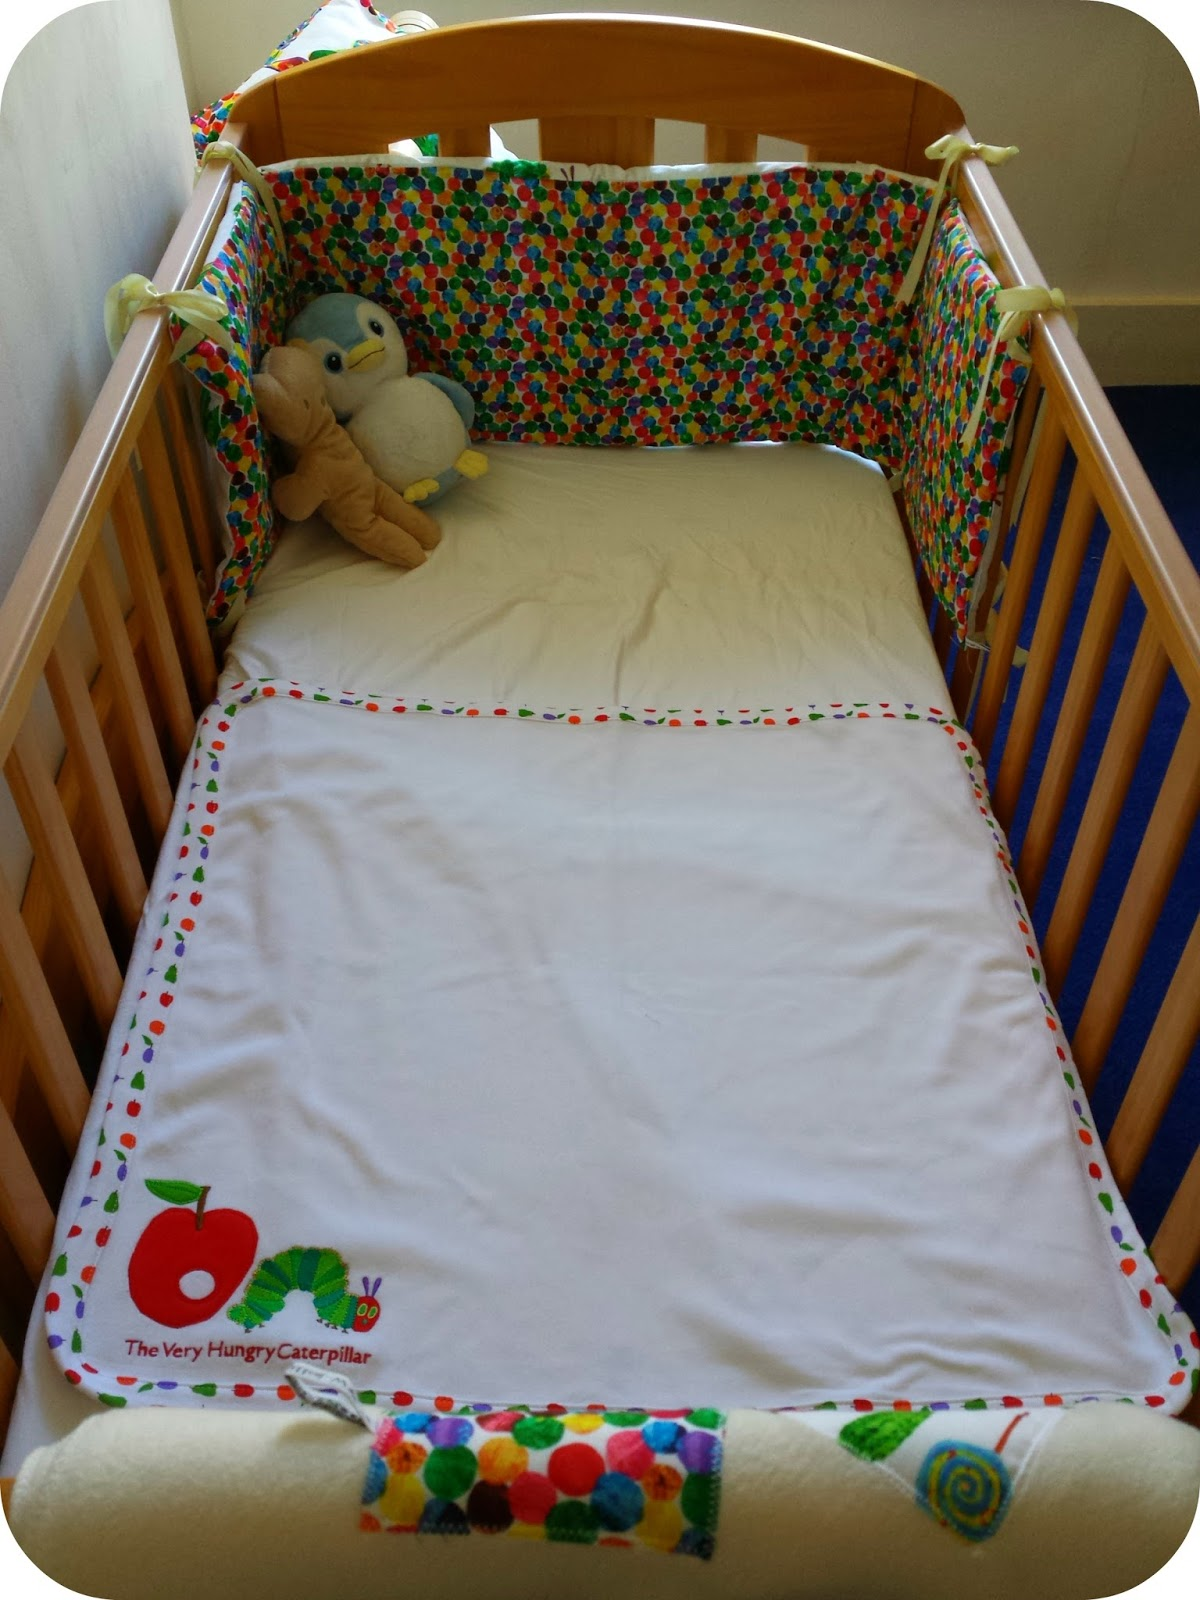 Hungry Caterpillar Nursery Bedding Cot Very Eric